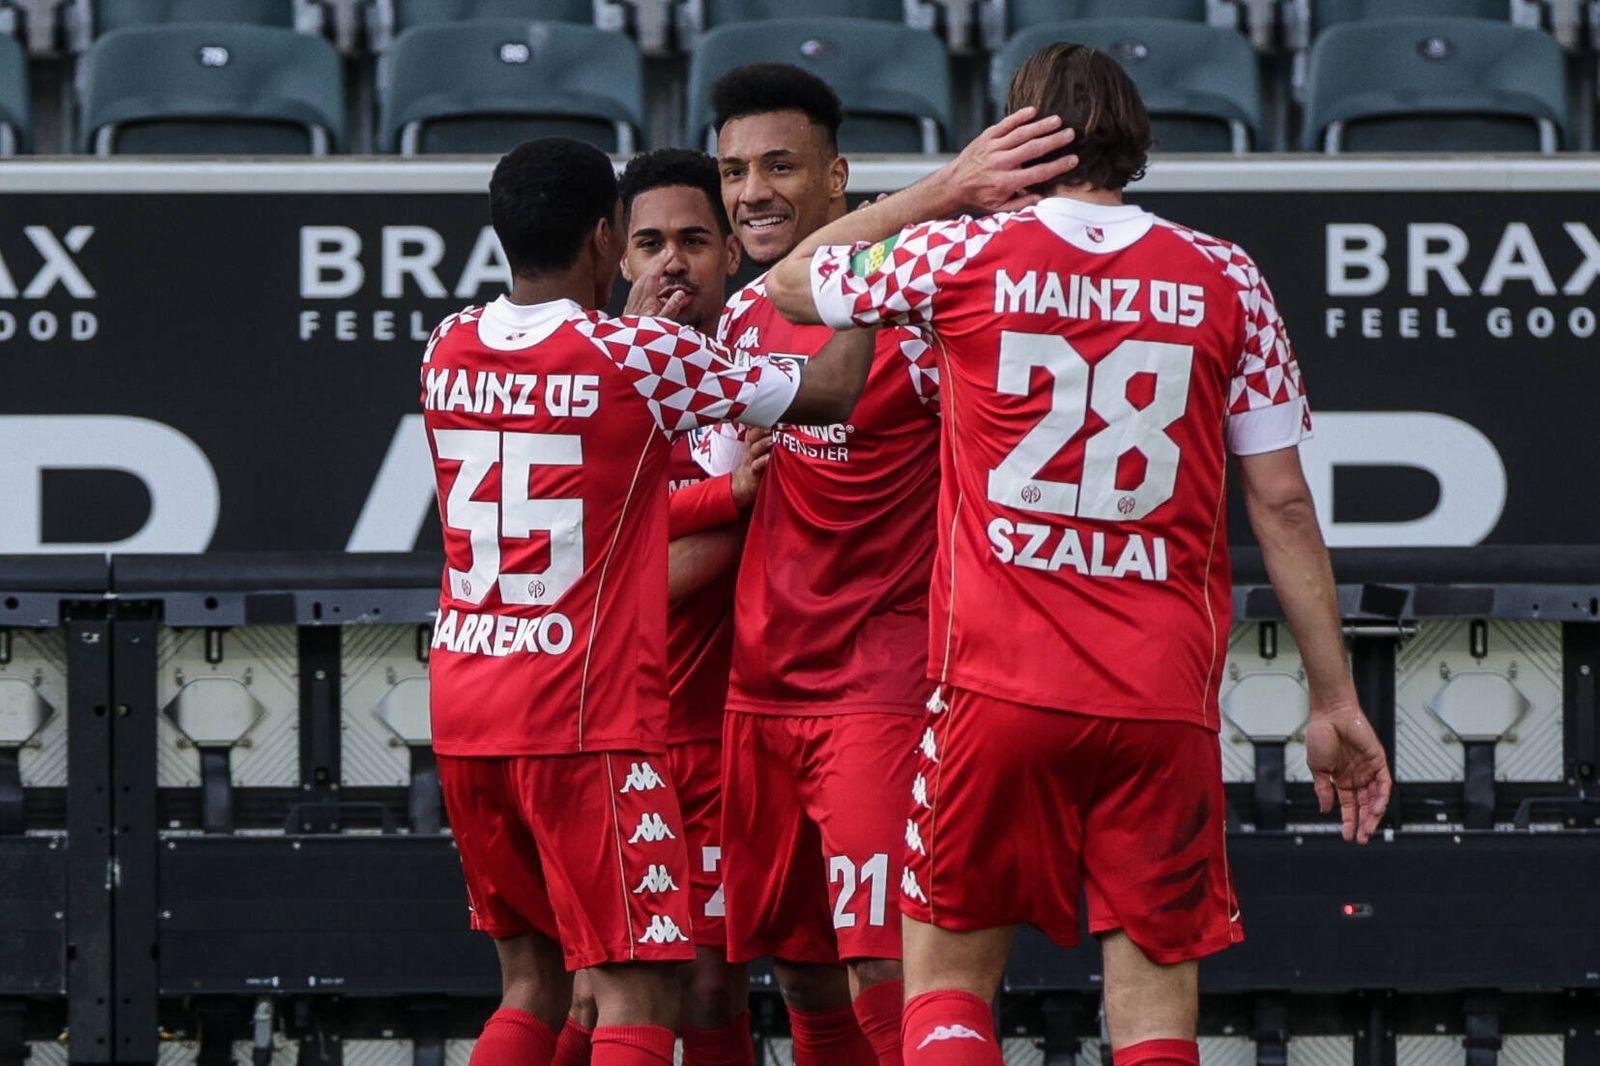 20.02.2021, Fussball, Saison 2020/2021, Bundesliga, 22. Spieltag - Borussia Mönchengladbach - FSV Mainz 05 v. l. Leandr